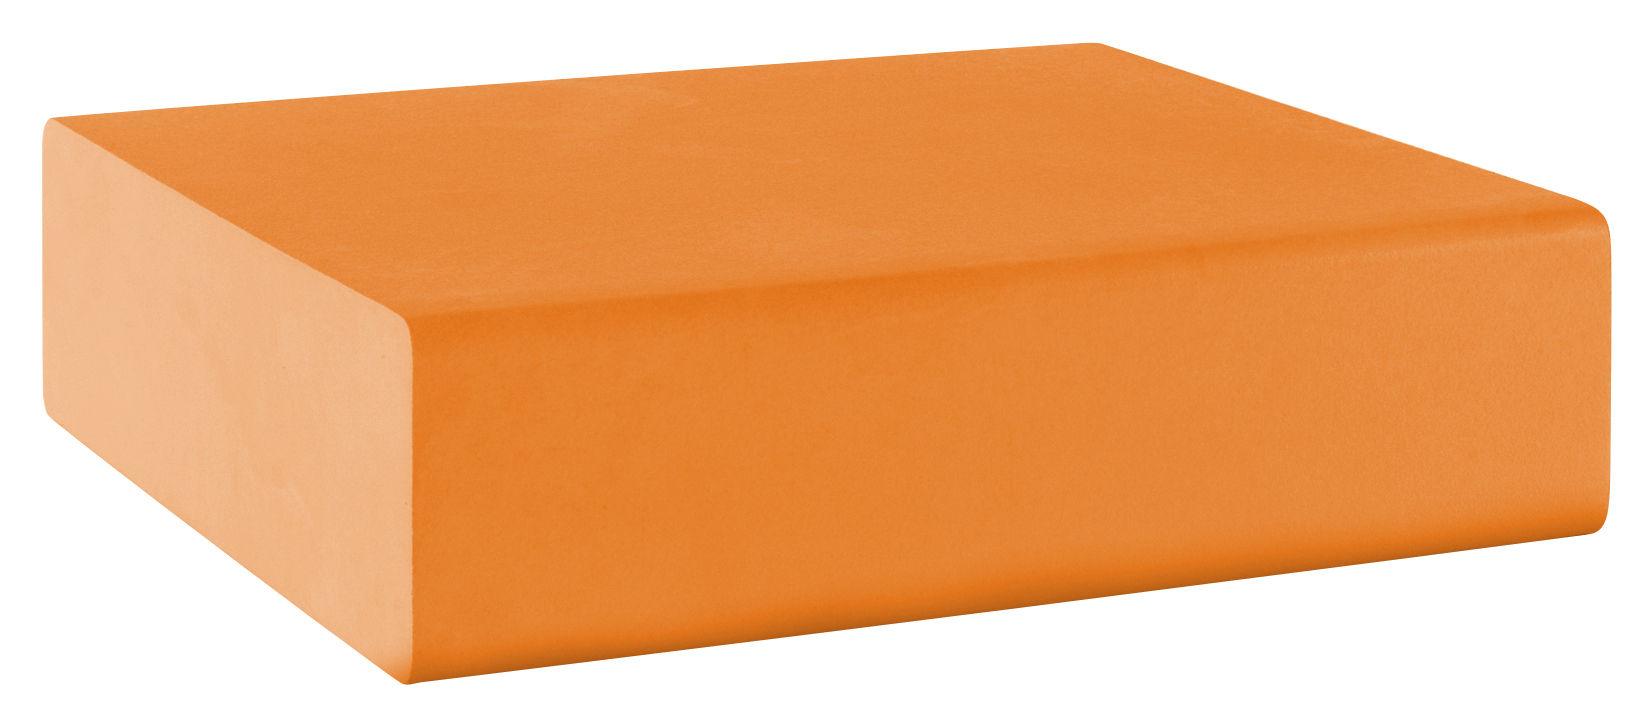 Arredamento - Mobili Ados  - Pouf Matrass Mat 75 di Quinze & Milan - Arancione - Schiuma di poliuretano